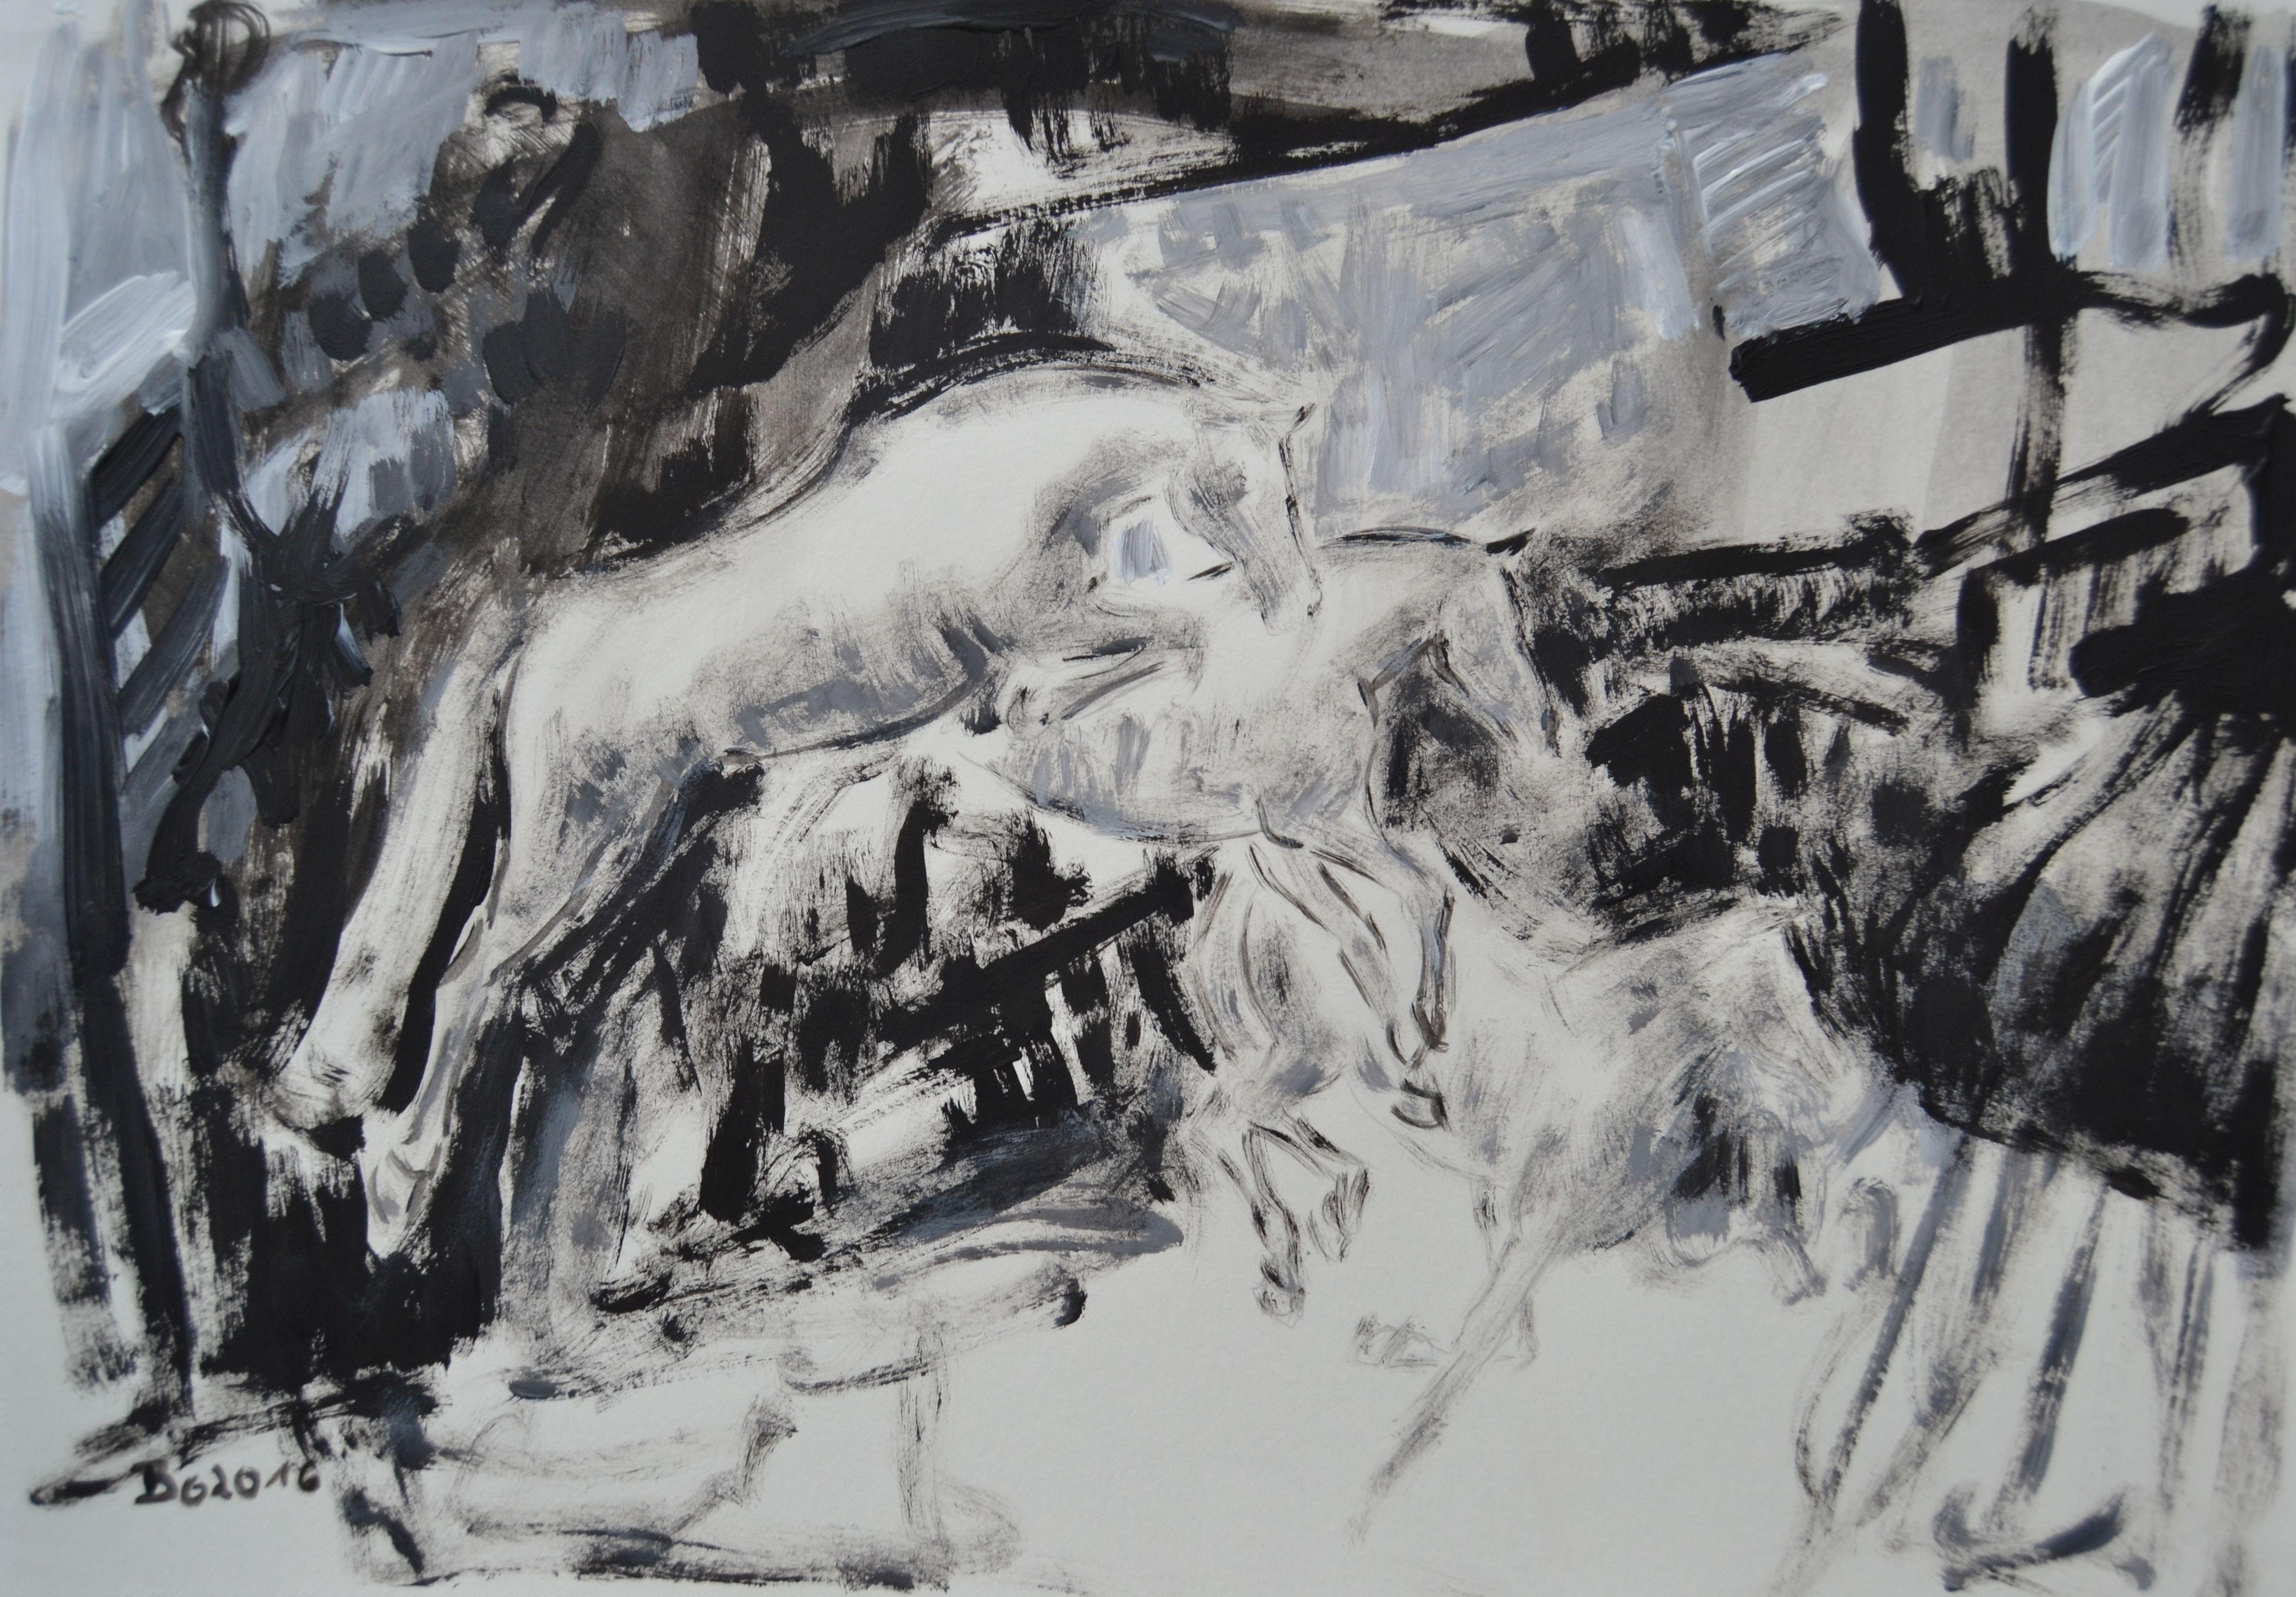 2016 Sprungfolge 4, Acryl auf Papier 30 x 40